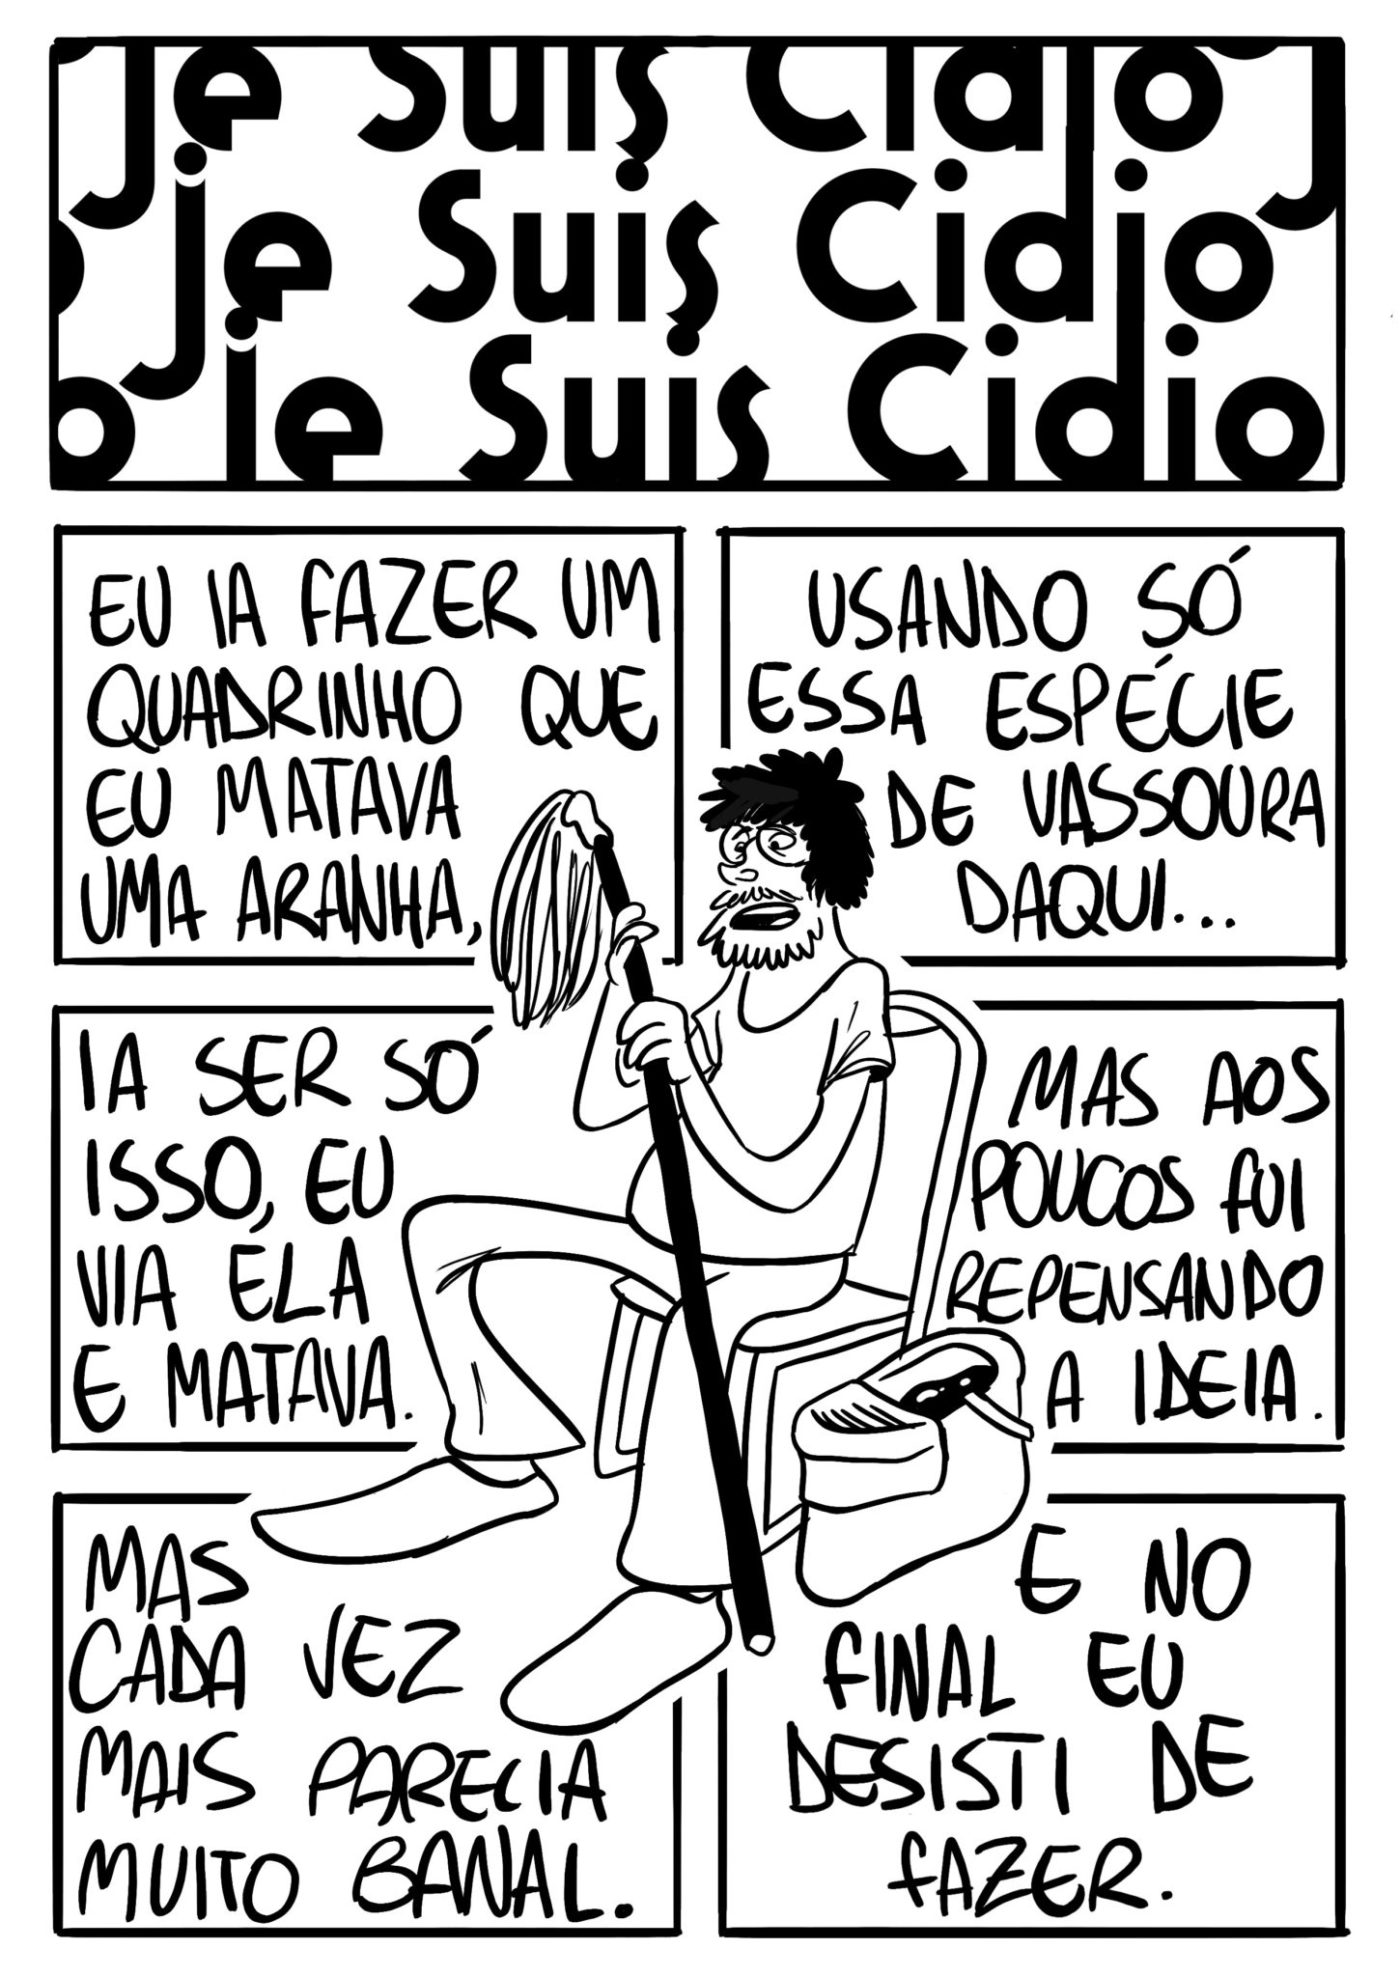 Je Suis Cídio #17, por João B. Godoi